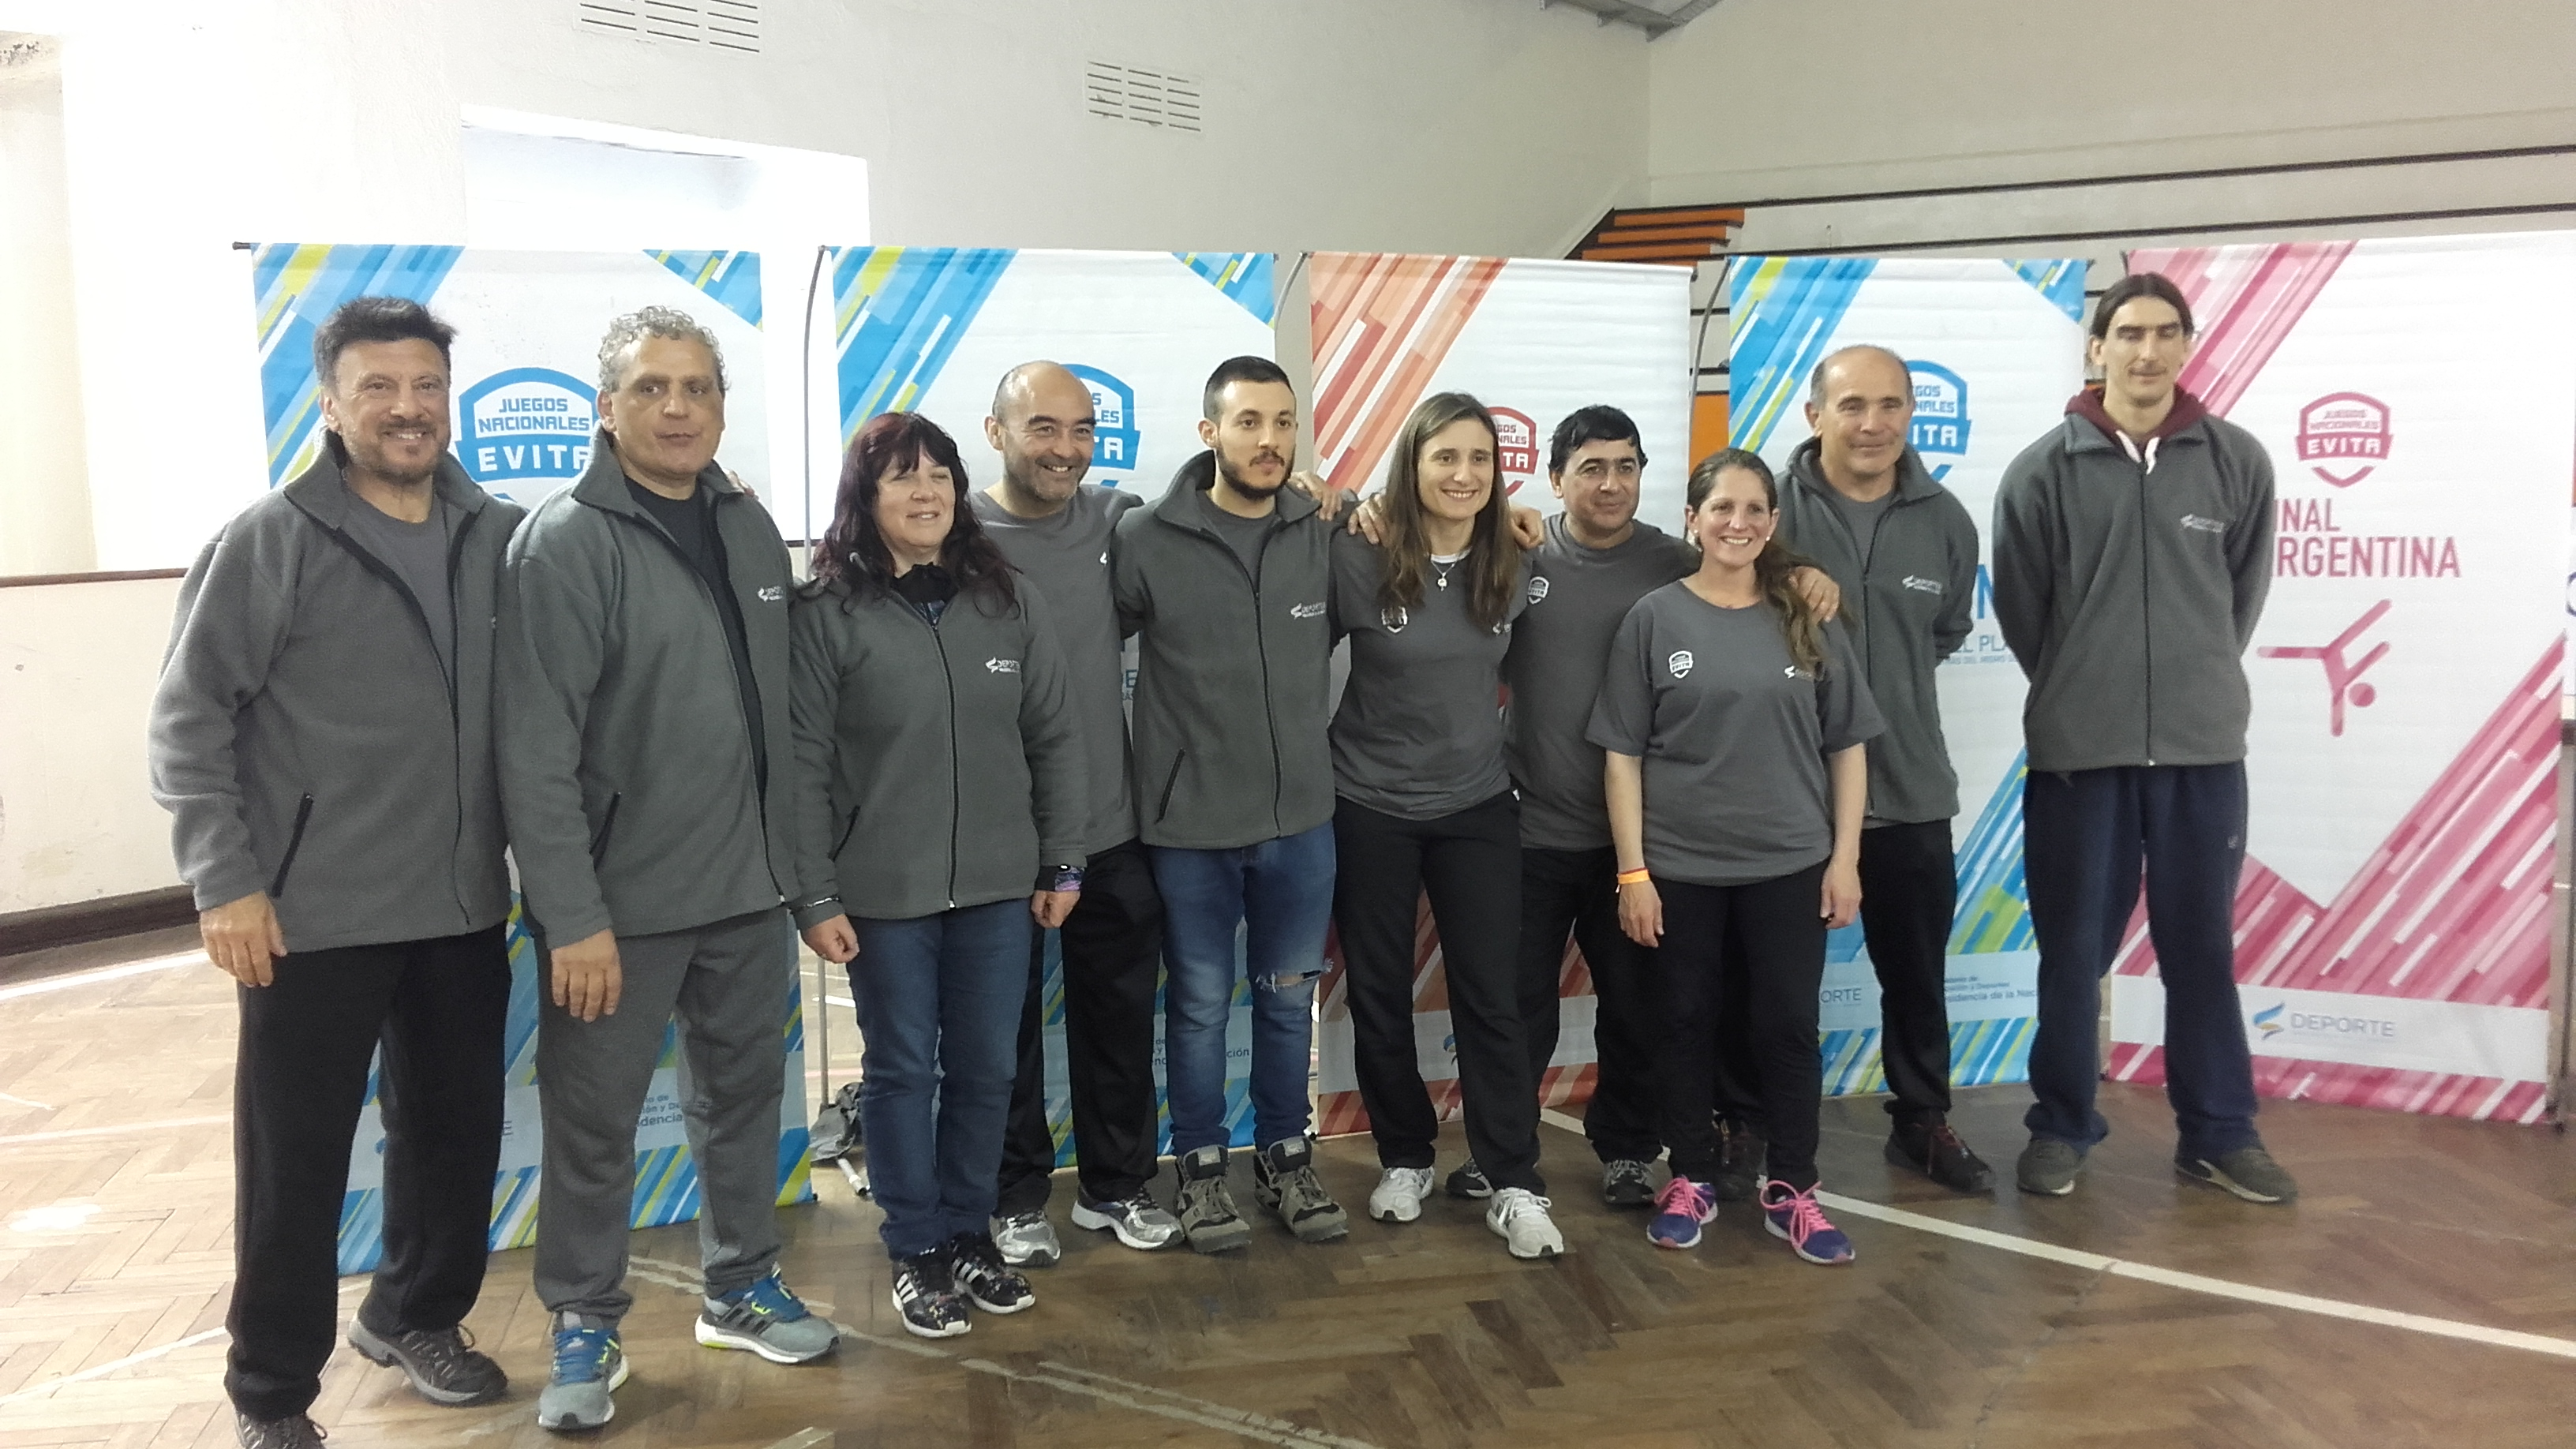 Staff Confederaciòn Argentina de Judo Finales   Juegos Evita:J.Juri, A.Janeiro, L.Escudero , L.Kohatsu,K.Juri,V.Tittarelli,W.Olmos,  . Olmos ,J.Navarrete y  F. Alonso